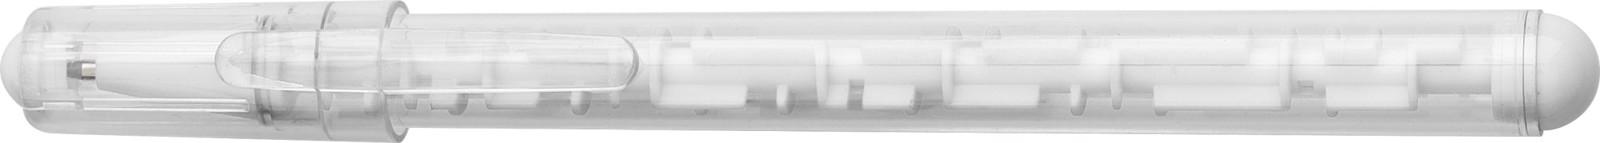 ABS ballpen - White